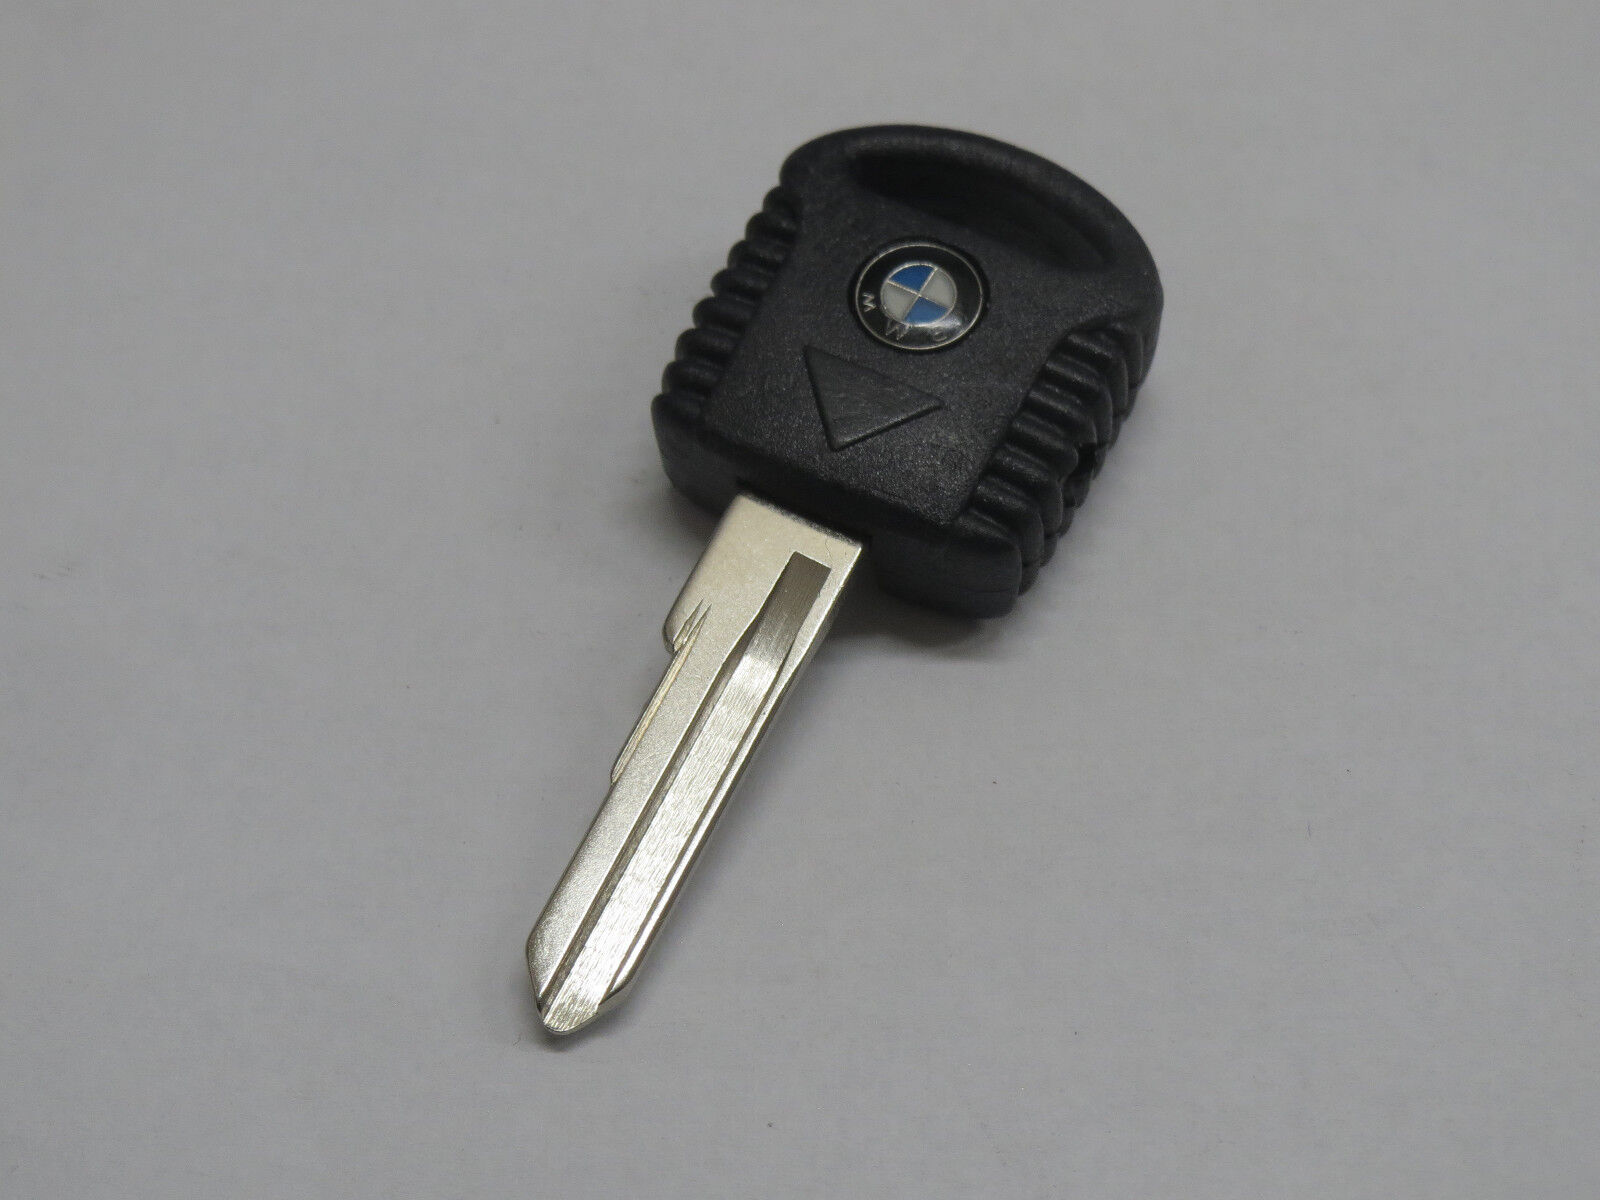 BMW R45 R60 R65 R75 R80 R90 R100 K75 K100 K1100 Klappschlüssel Roling Key blank